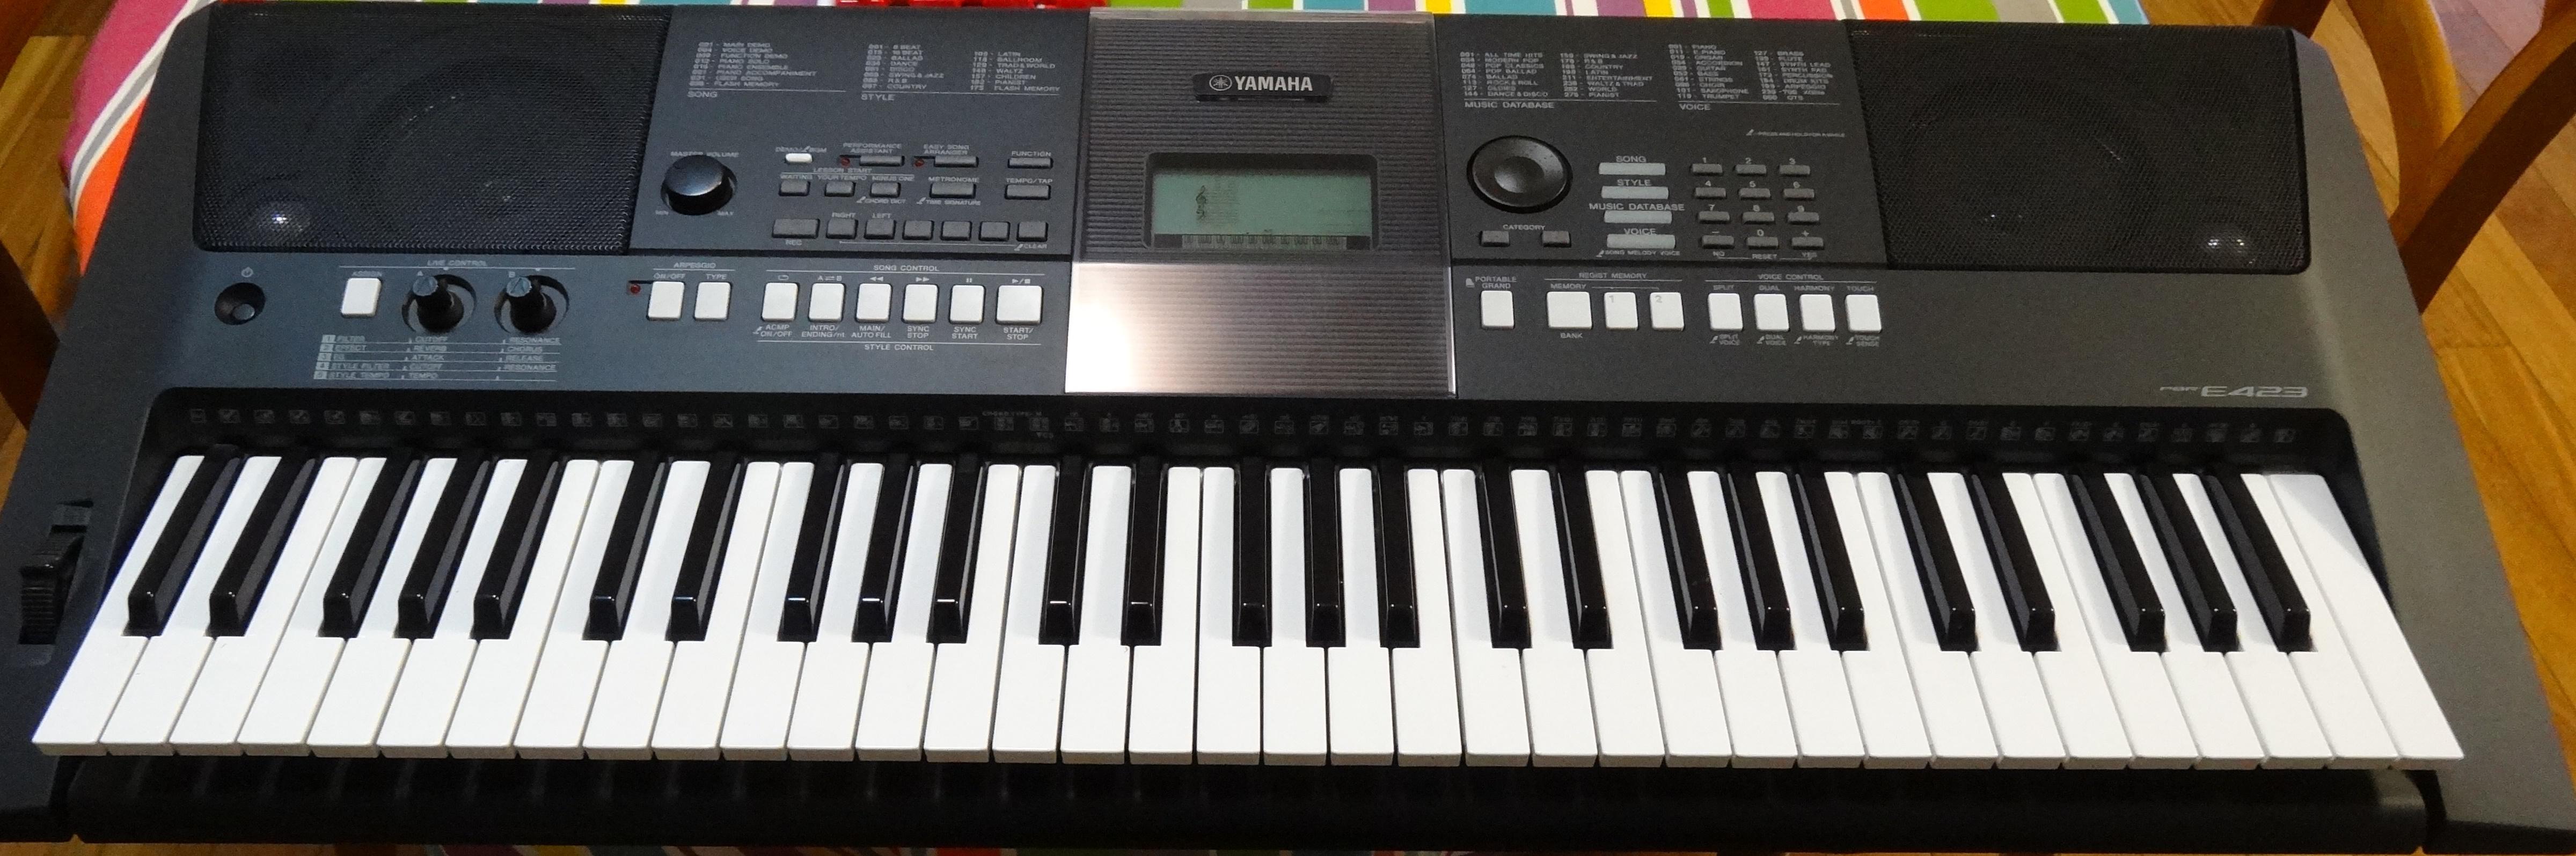 yamaha psr e423 image 990503 audiofanzine rh en audiofanzine com Yamaha PSR E423 Demo yamaha psr e423 service manual